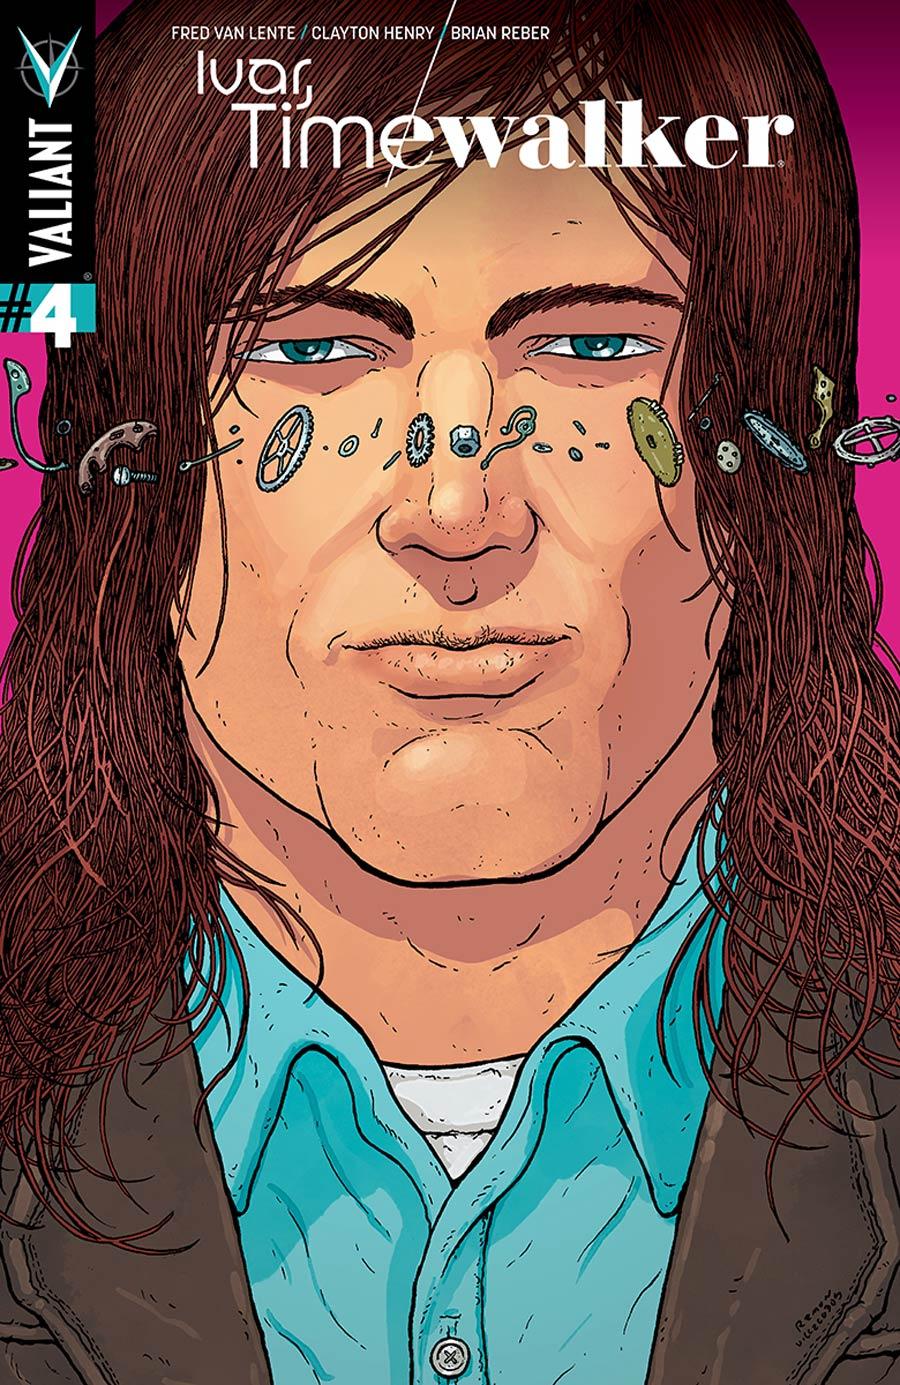 Ivar Timewalker #4 Cover C Incentive Ramon Villalobos Variant Cover